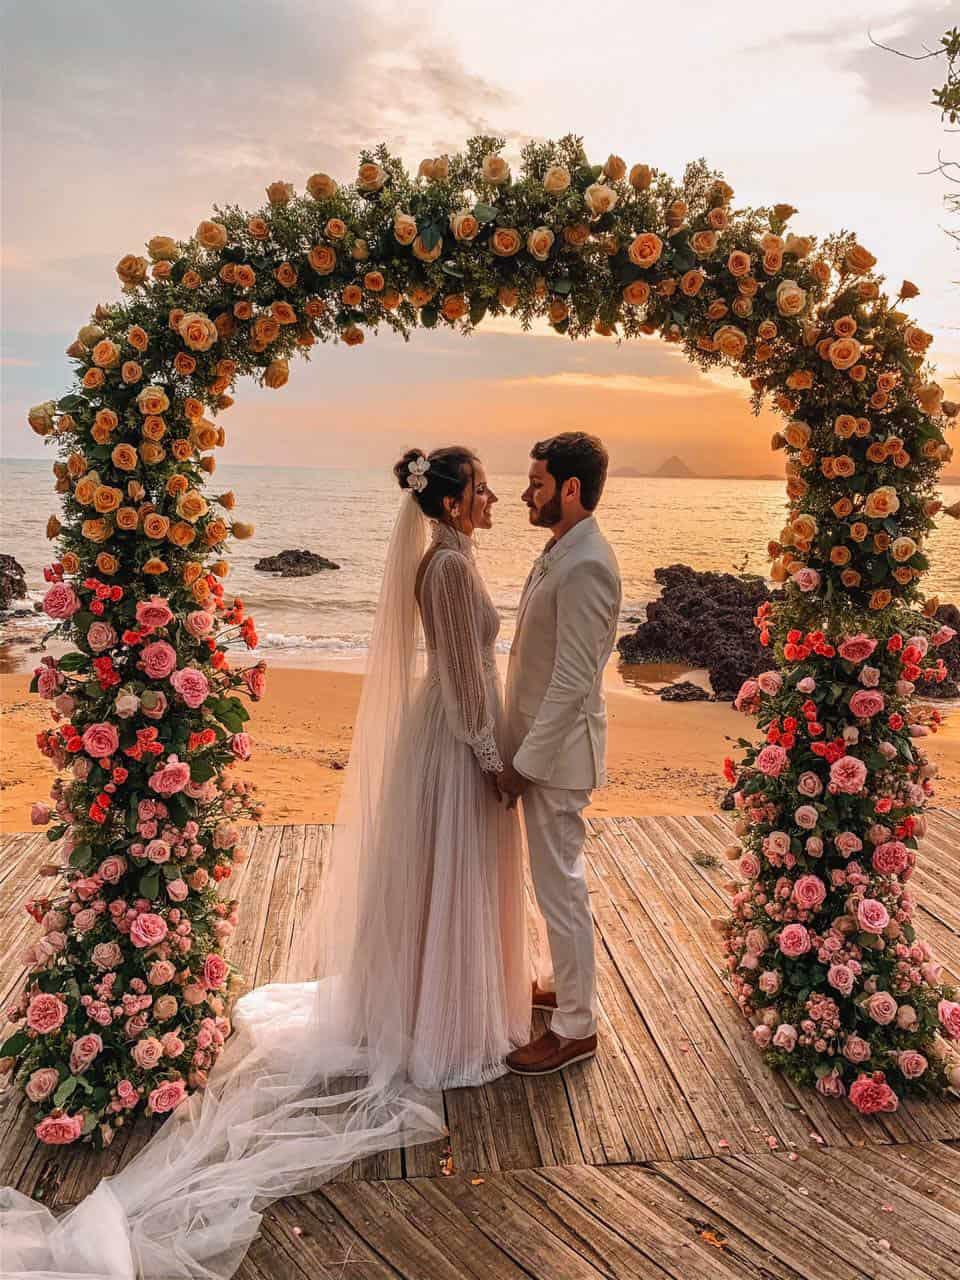 Casa-da-Maria-casamento-Mariana-e-Luan-Castelhanos-cerimonial-Vivianne-Melo-Espirito-Santo-Fotografia-Mariana-Andrich38